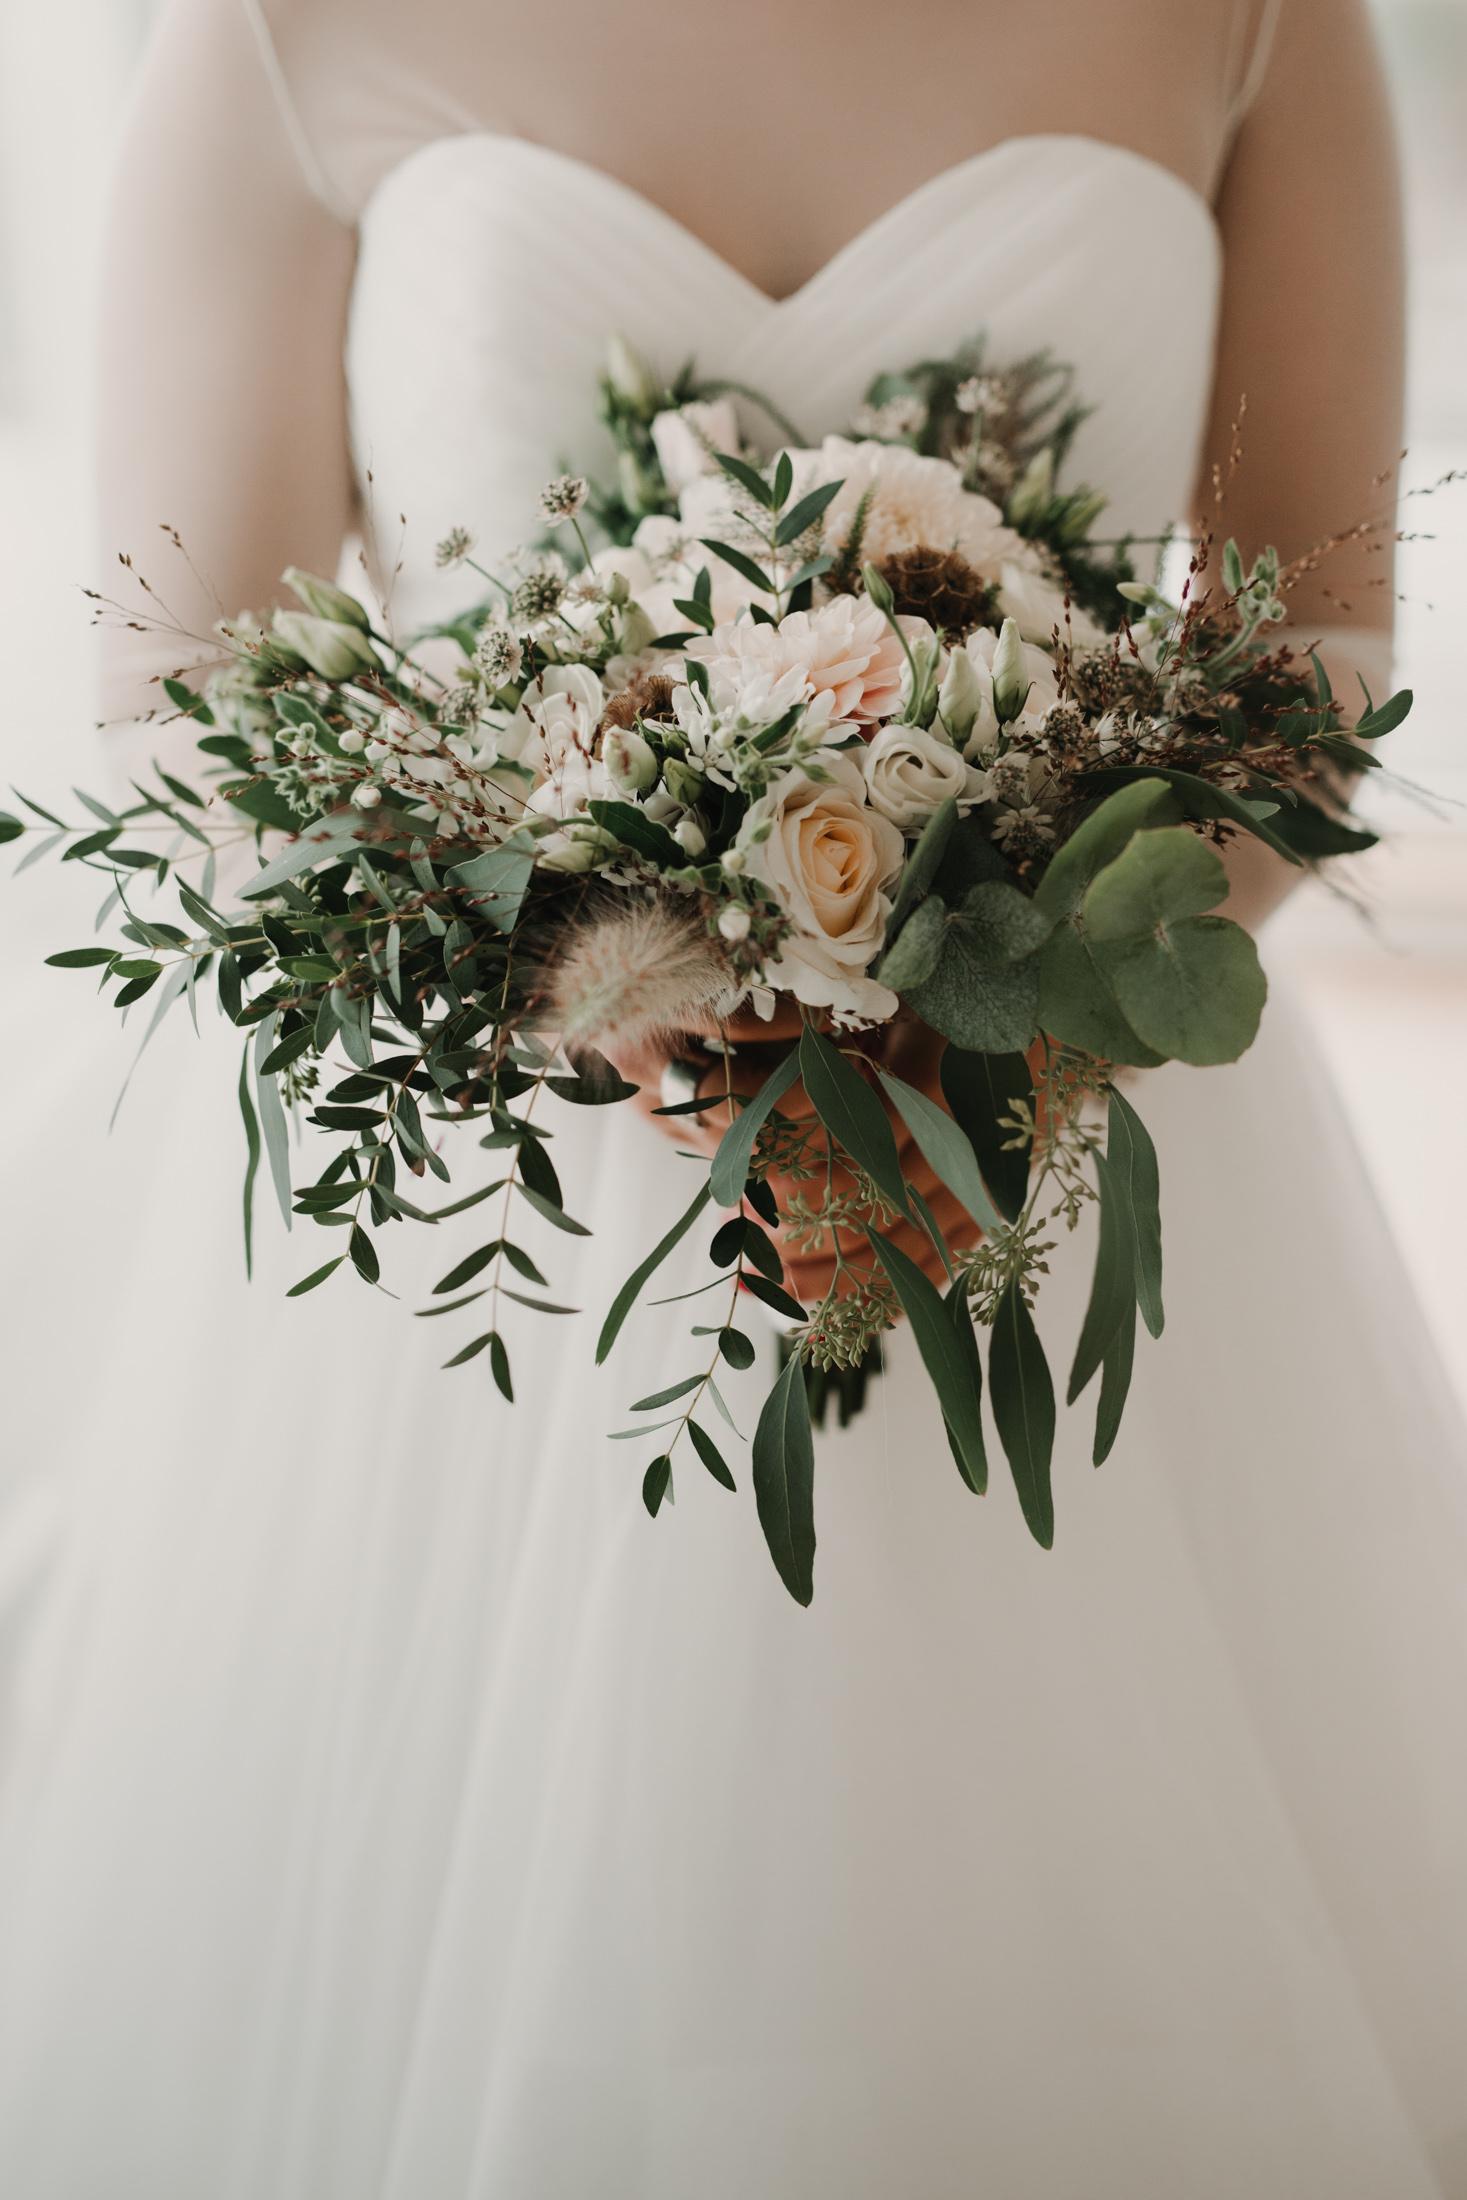 destination wedding photographer Gothenburg Sweden Bröllopsfotograf Göteborg Hjuvik Cattis Fletcher Lisa och max bröllop blombukett